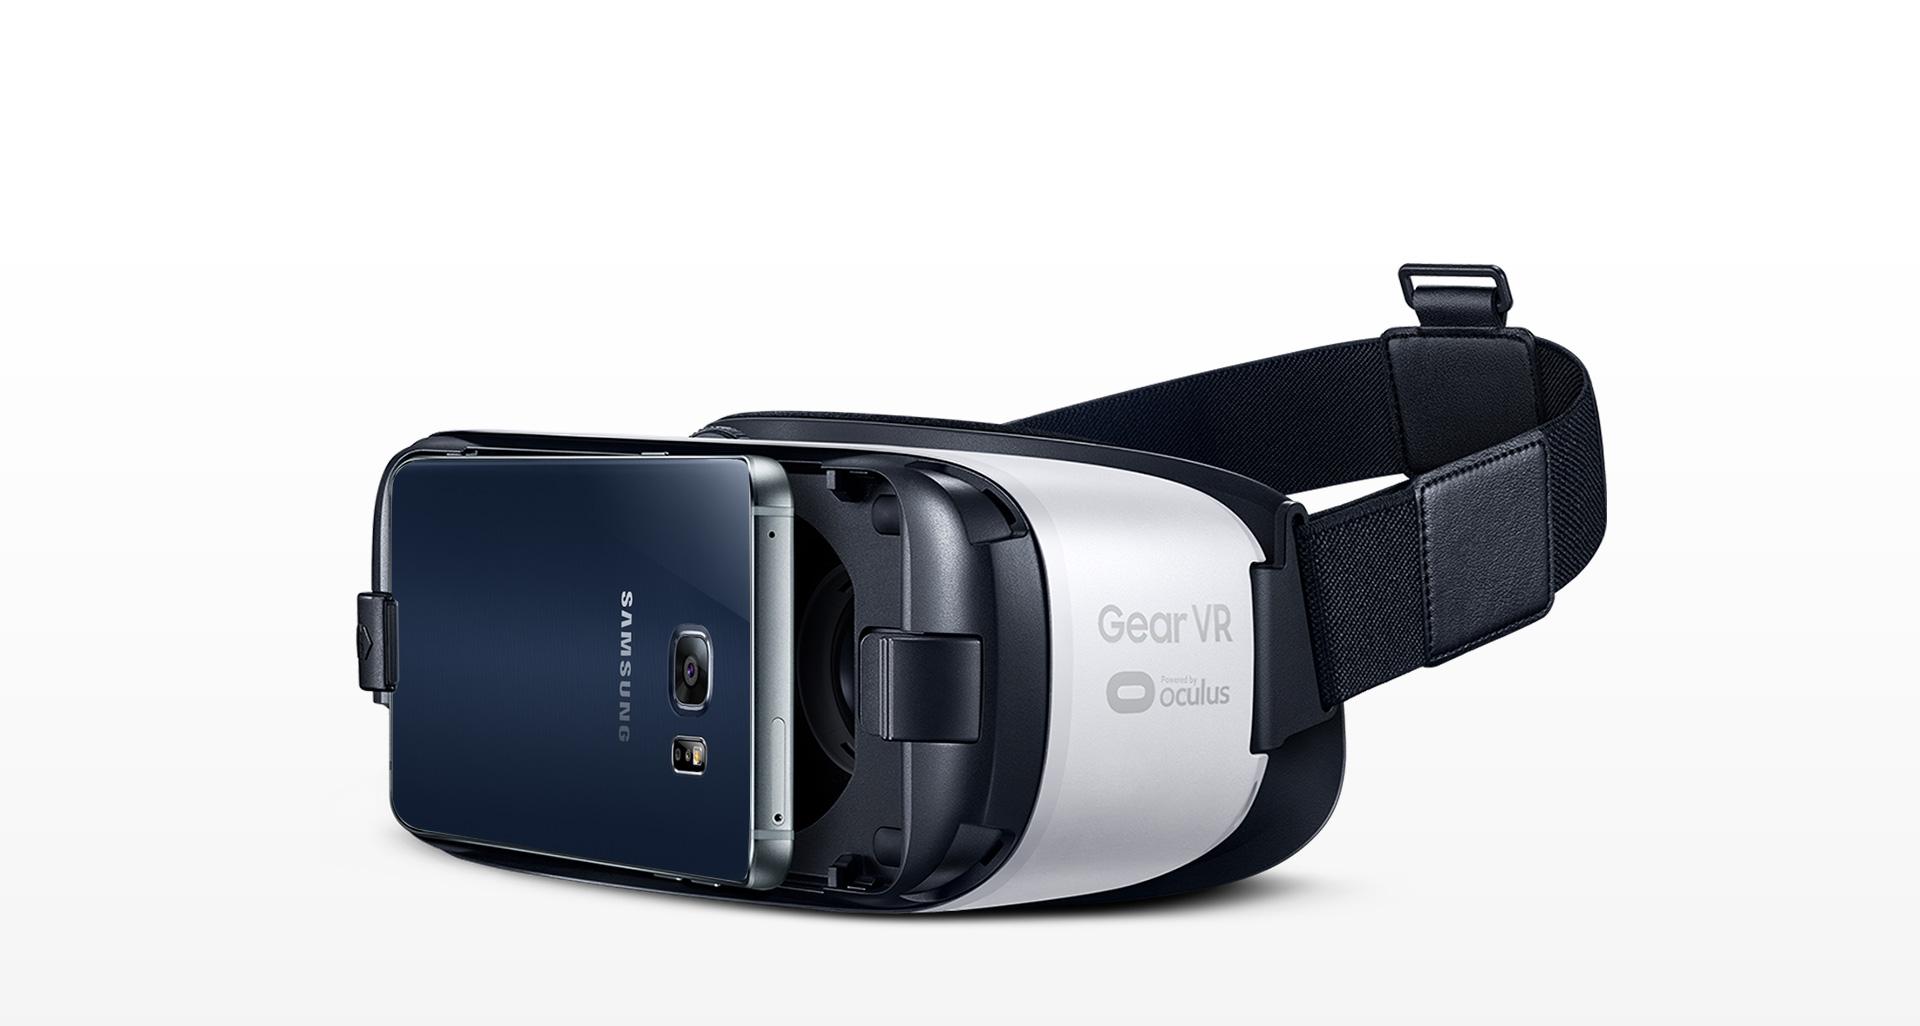 Samsung_S7_edge_GearVR.PNG